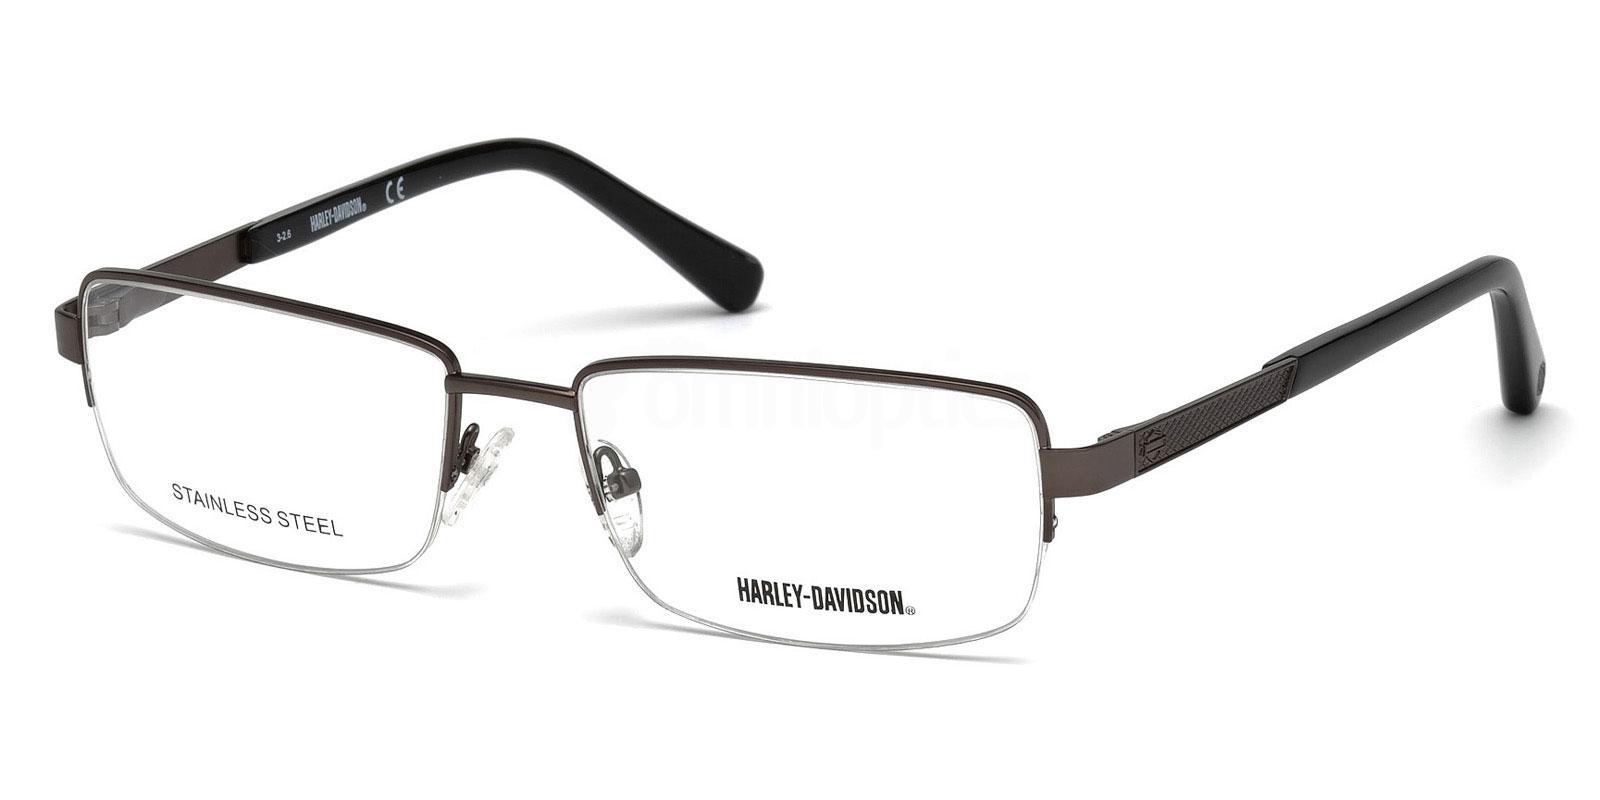 009 HD0750 Glasses, Harley Davidson